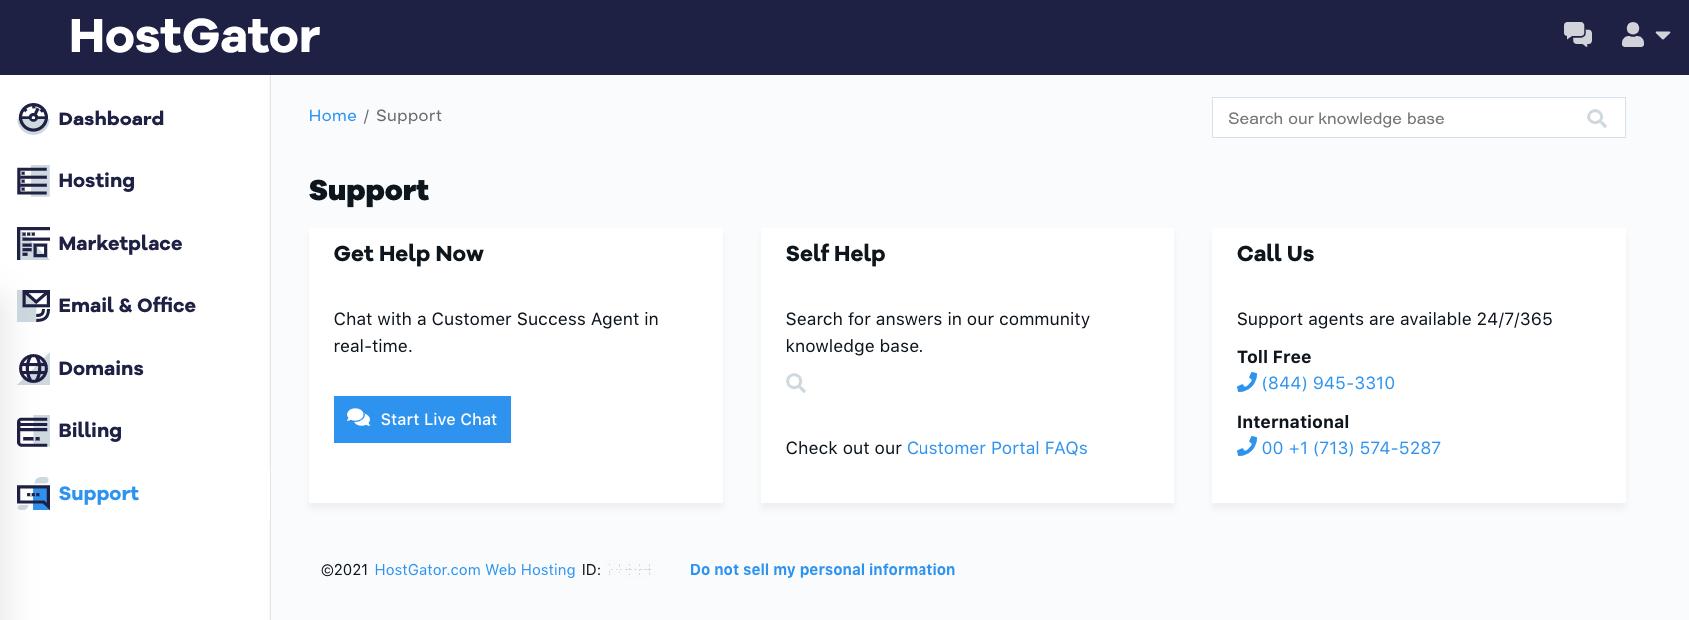 HostGator support options